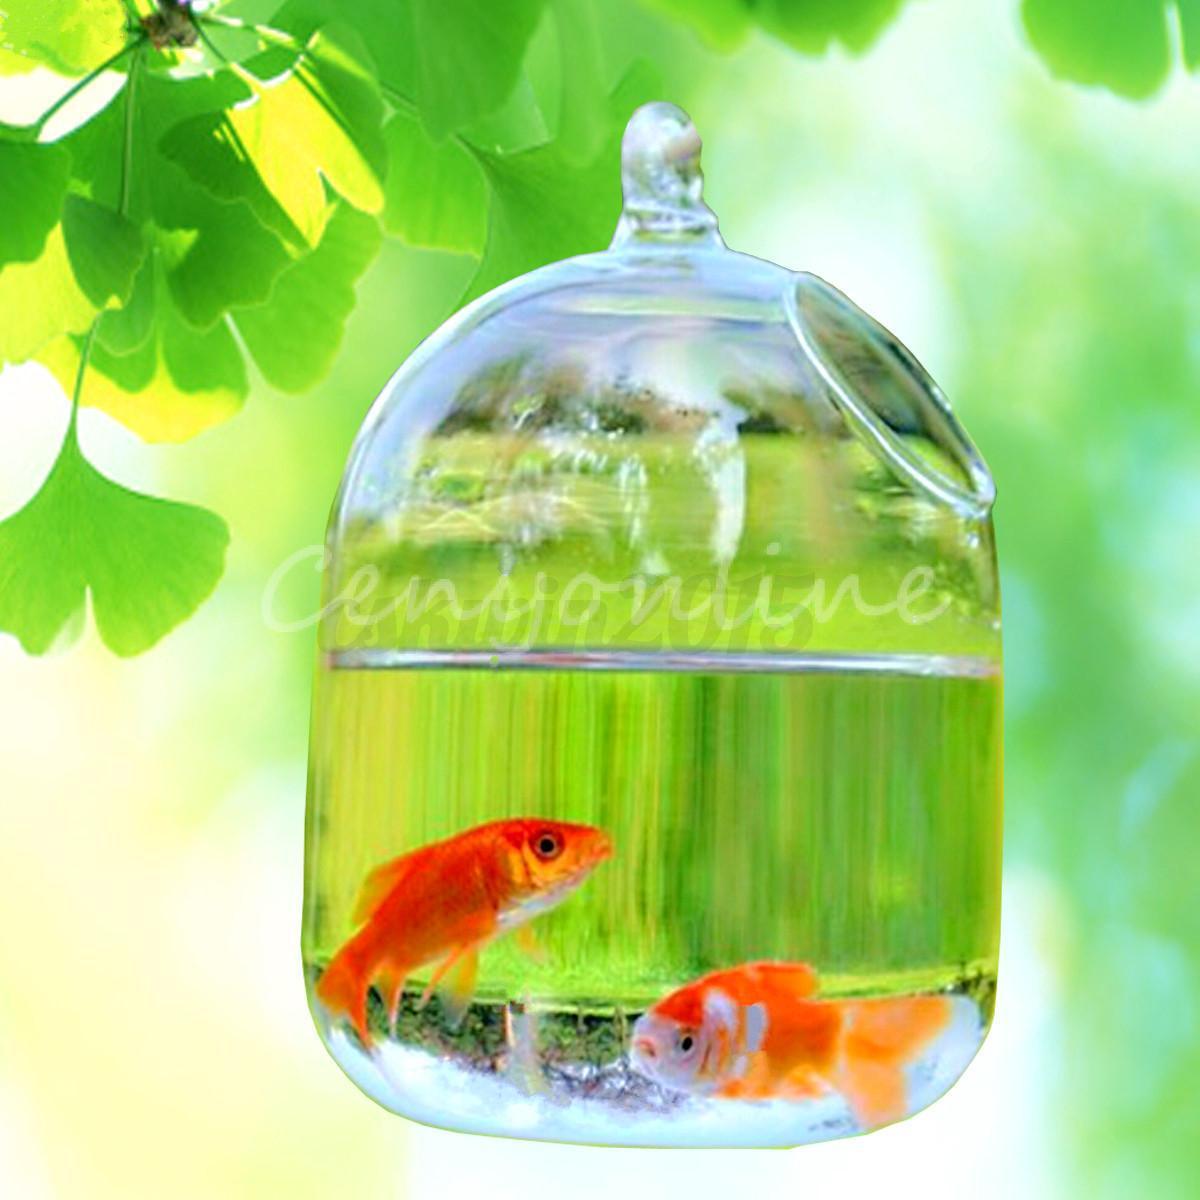 Hydroponic wall hanging bubble aquarium fish glass vase for Hydroponic aquarium with fish